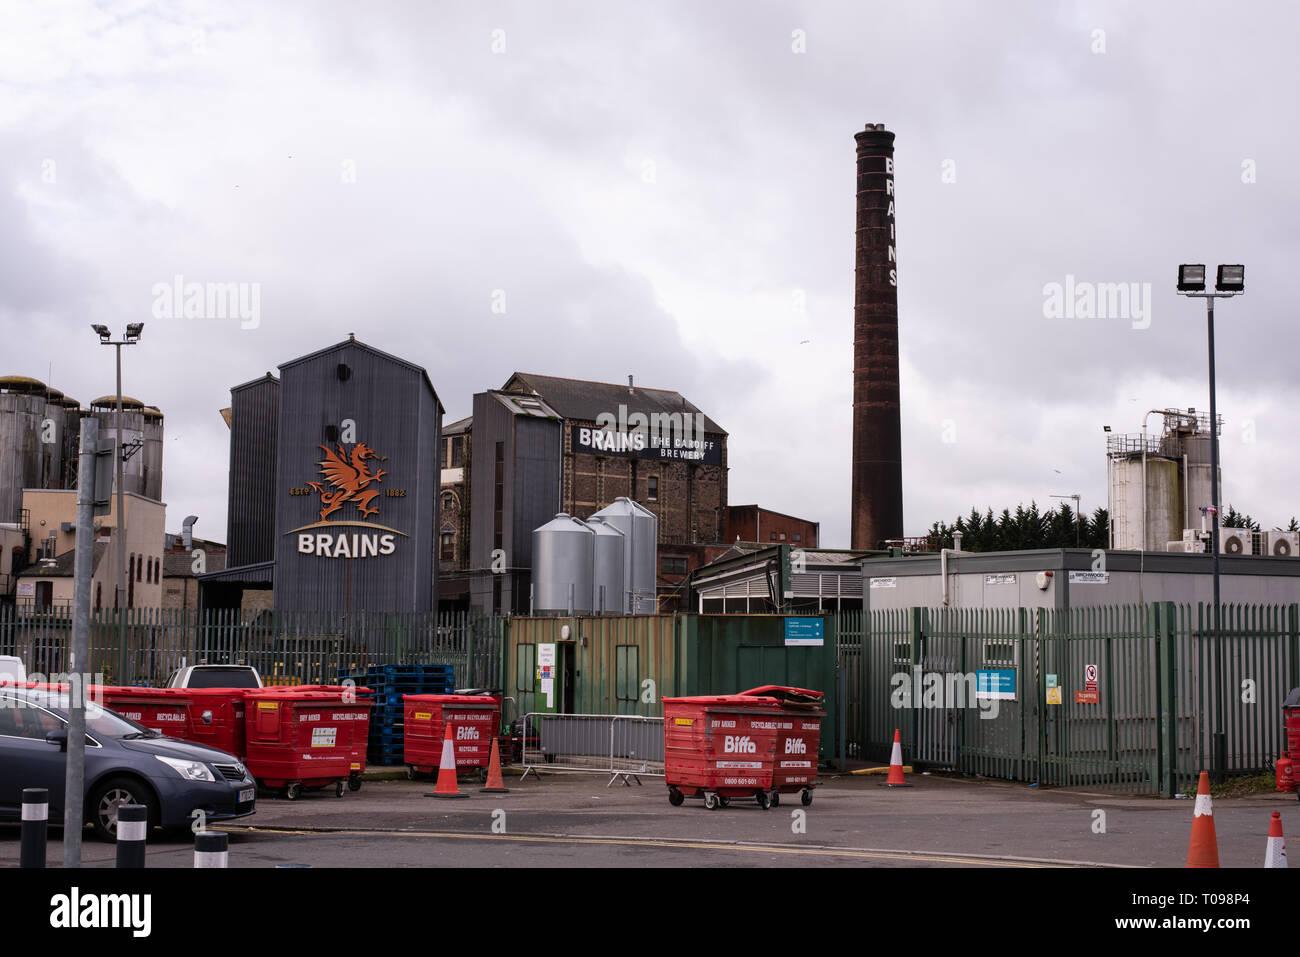 Brains Brewery Crawshay Street Cardiff number 3809 - Stock Image